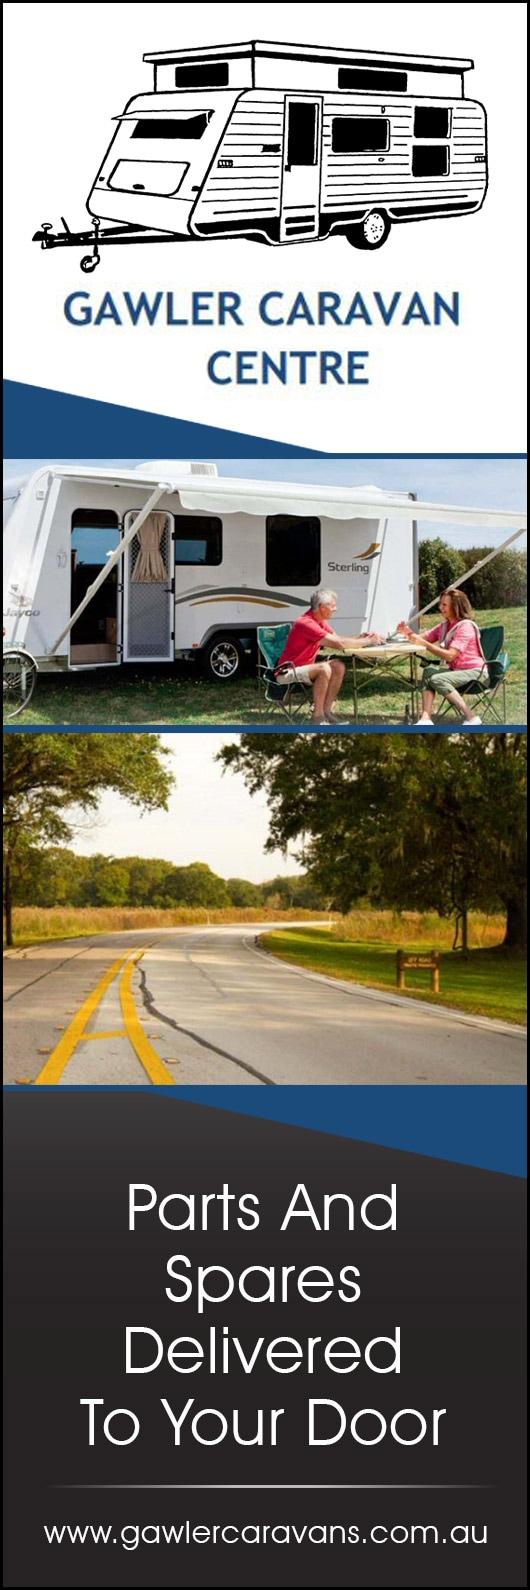 Gawler Caravan Centre - Promotion  sc 1 st  Yellow Pages & Gawler Caravan Centre - Caravan u0026 Camper Trailer Repairs - 57 Para ...